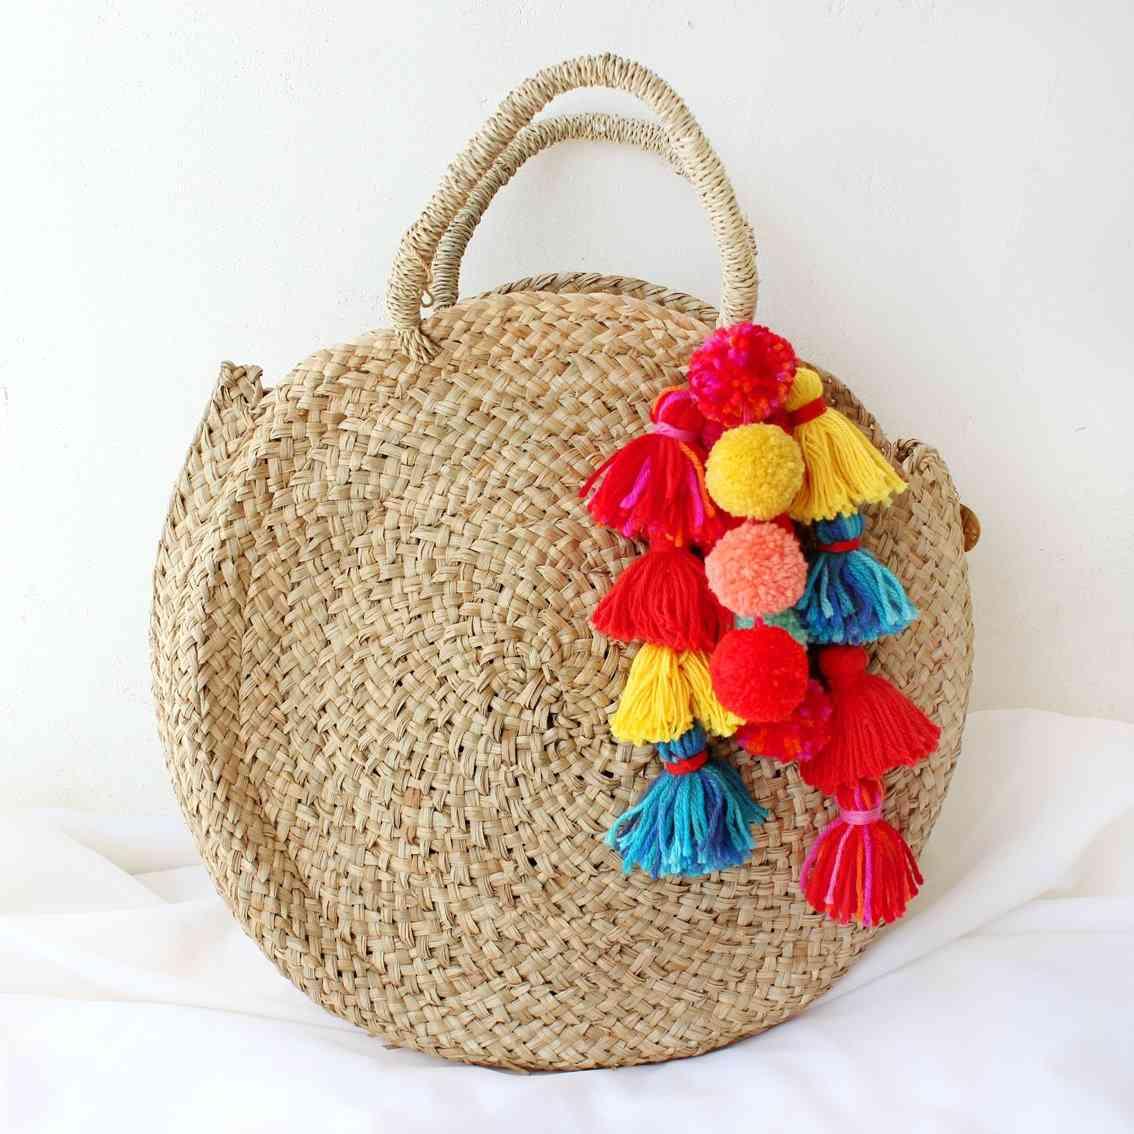 Round Straw Tote Bag With Coastal Tassels